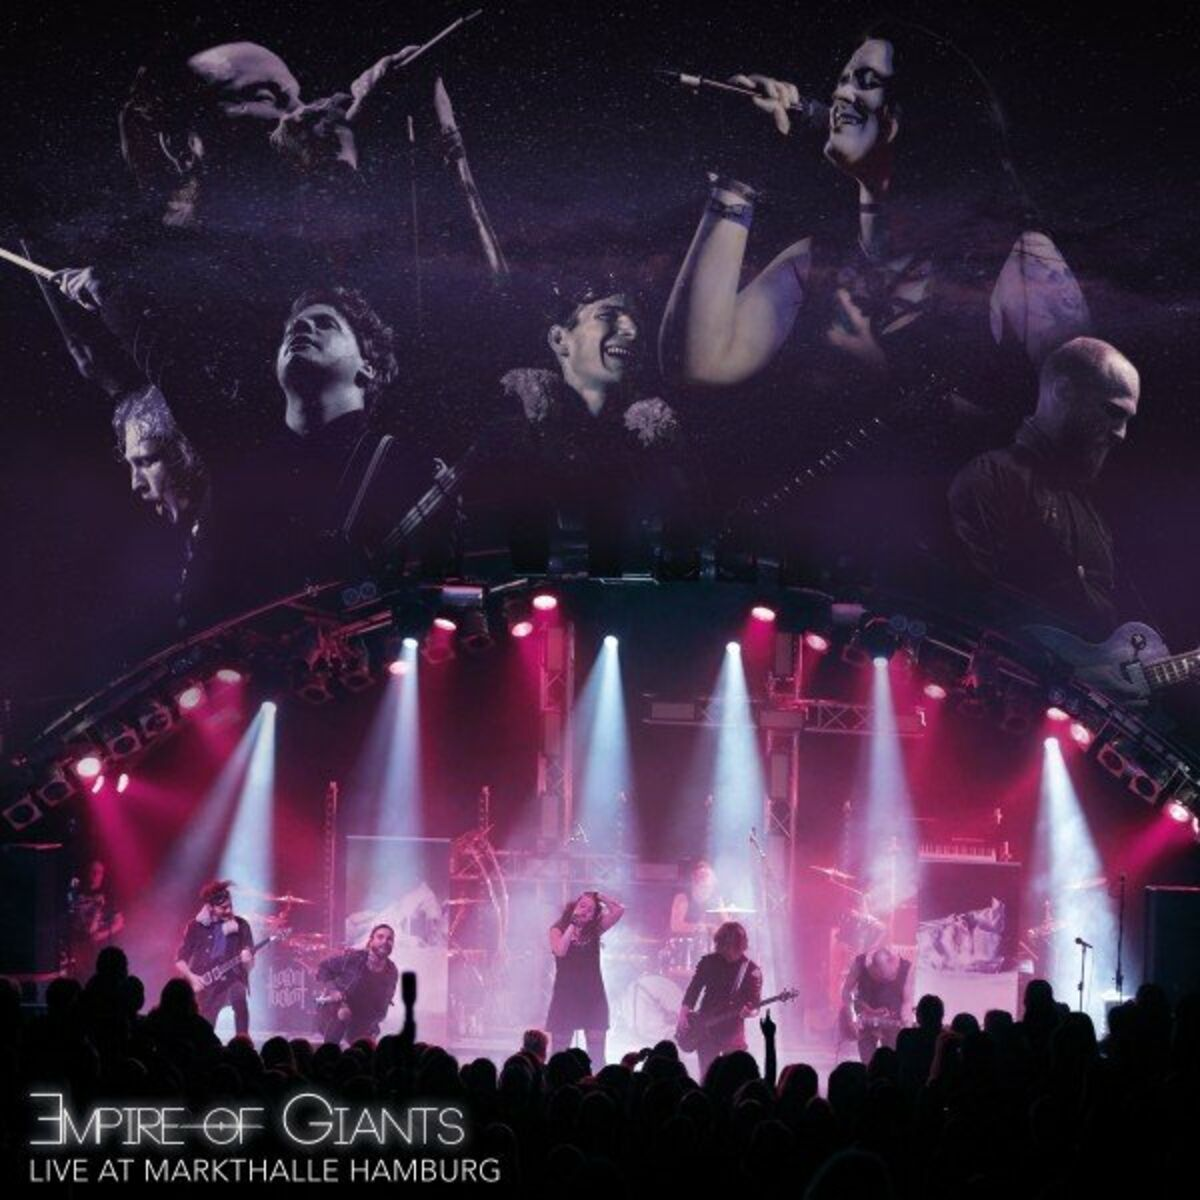 Empire of Giants - Days of Mayhem (Live at Markthalle Hamburg) [single] (2020)